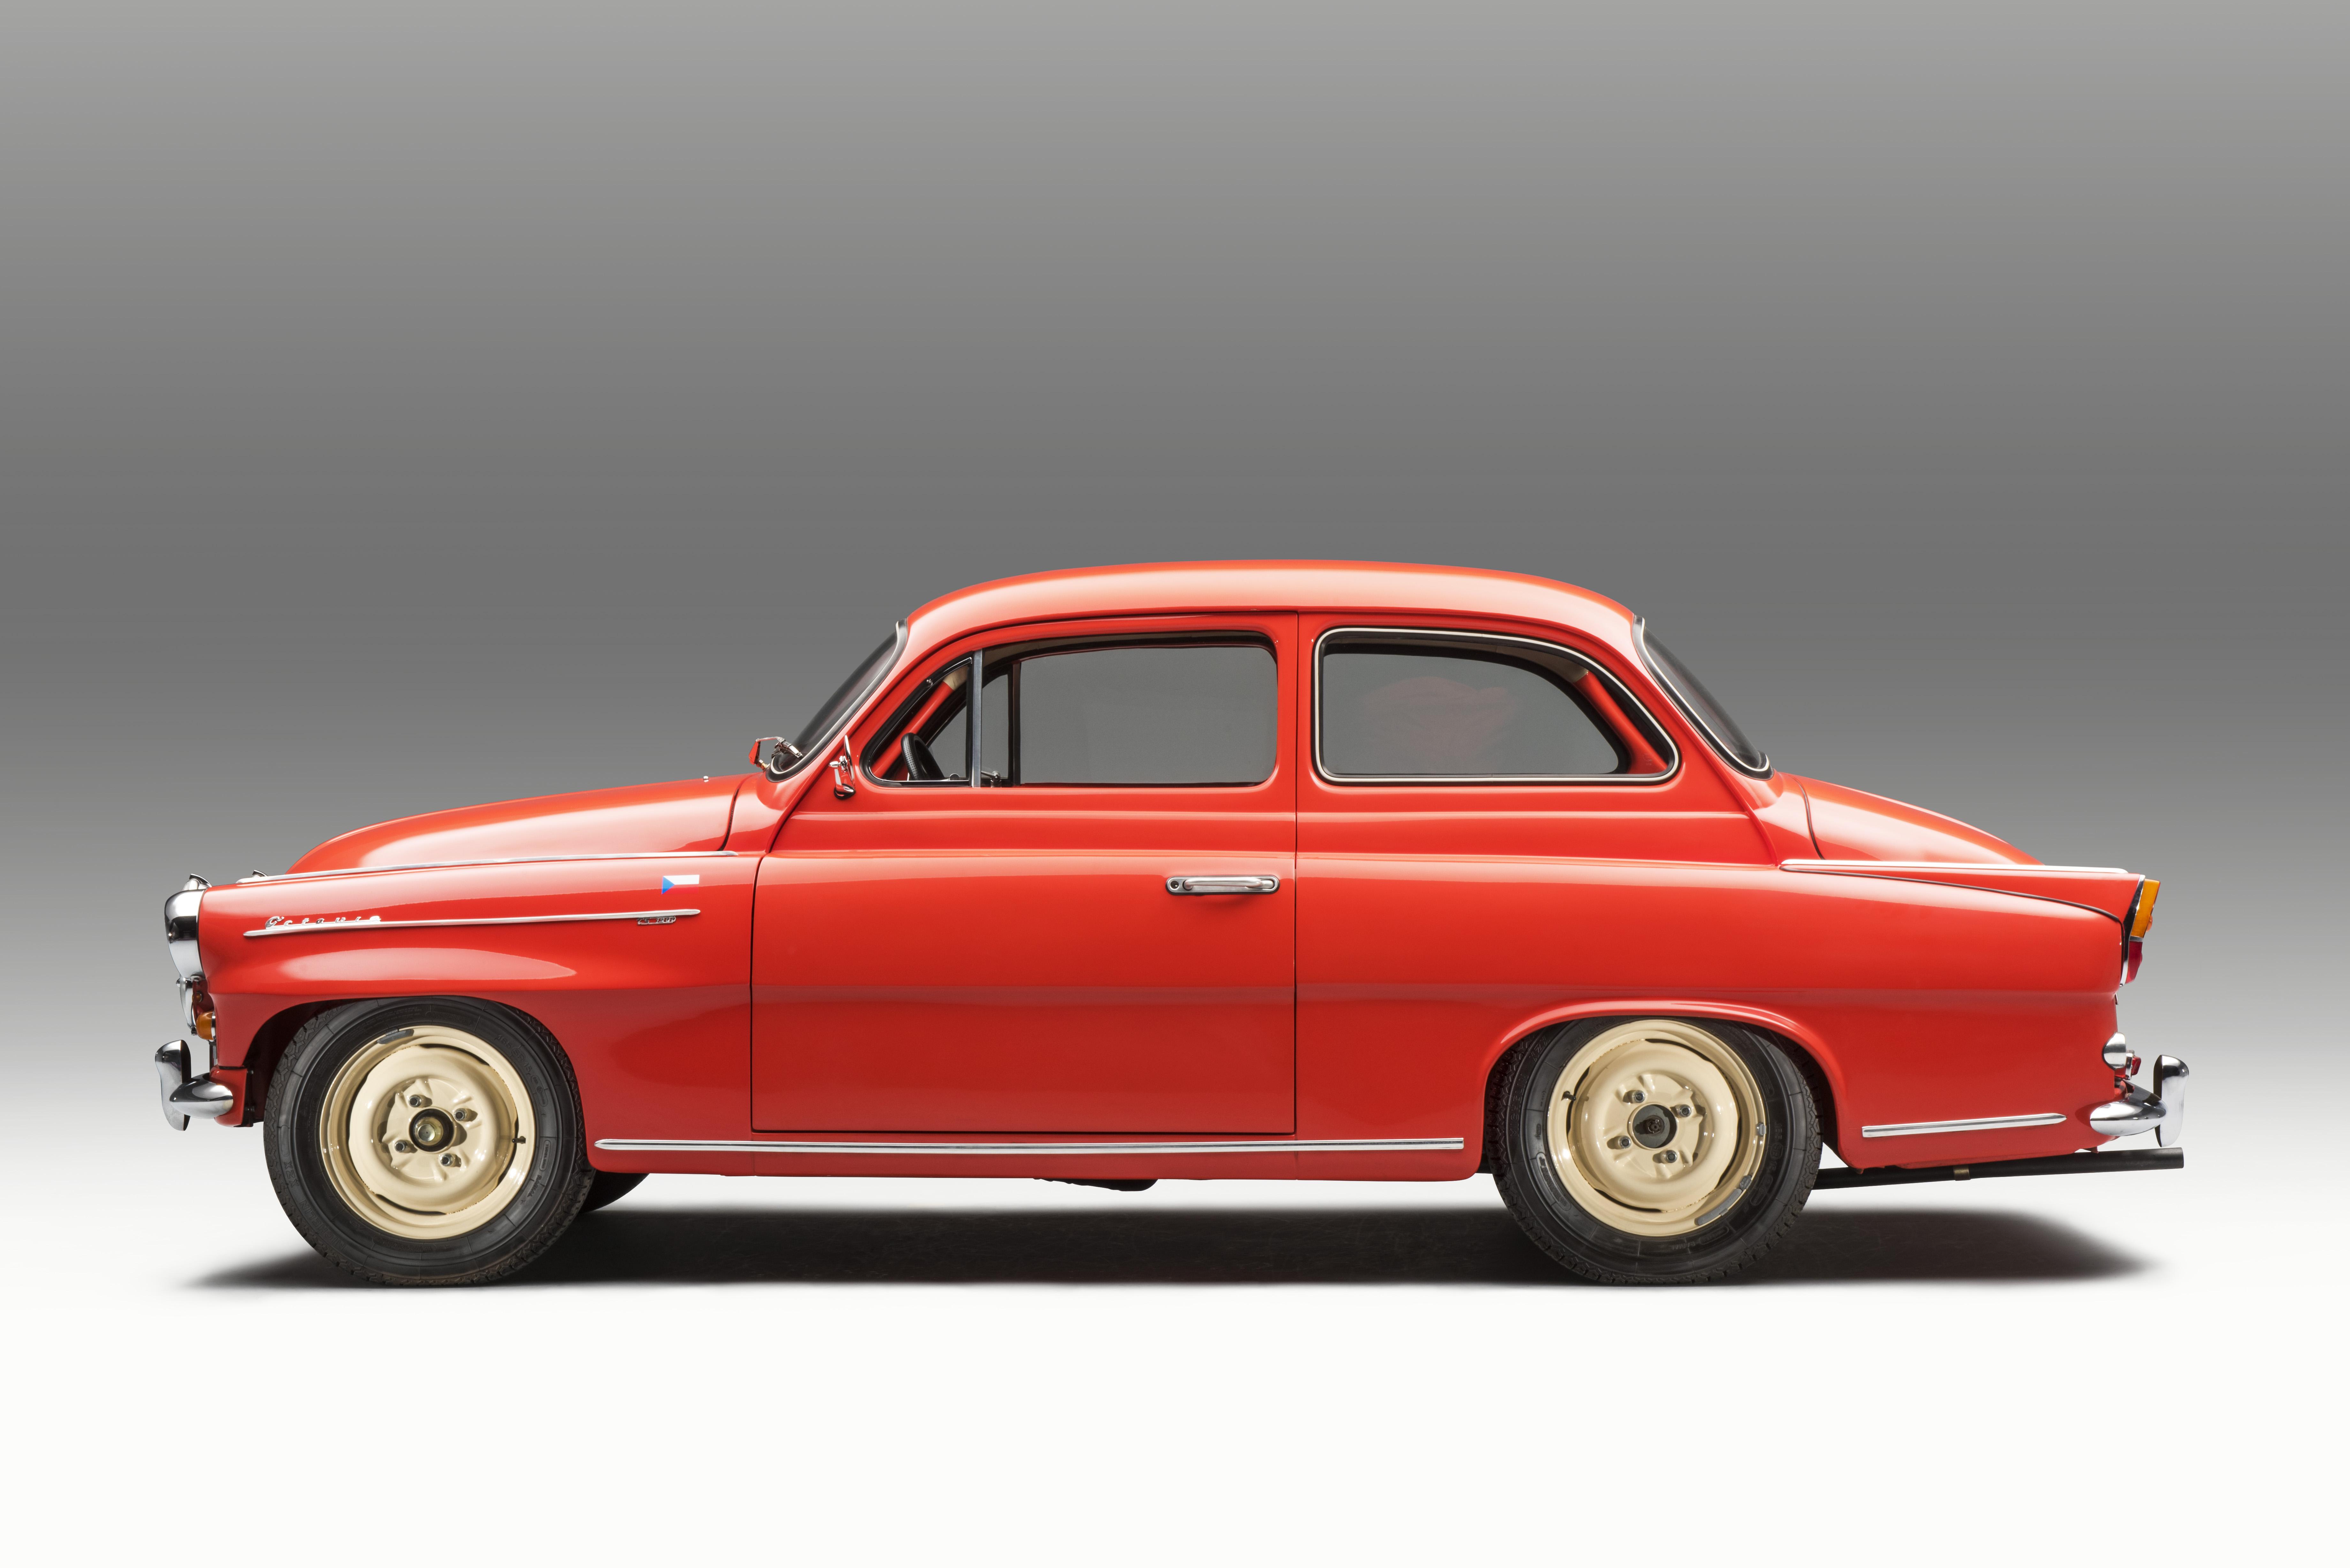 SKODA OCTAVIA TOURING SPORT (1960): Successful return to international rally courses - Image 5